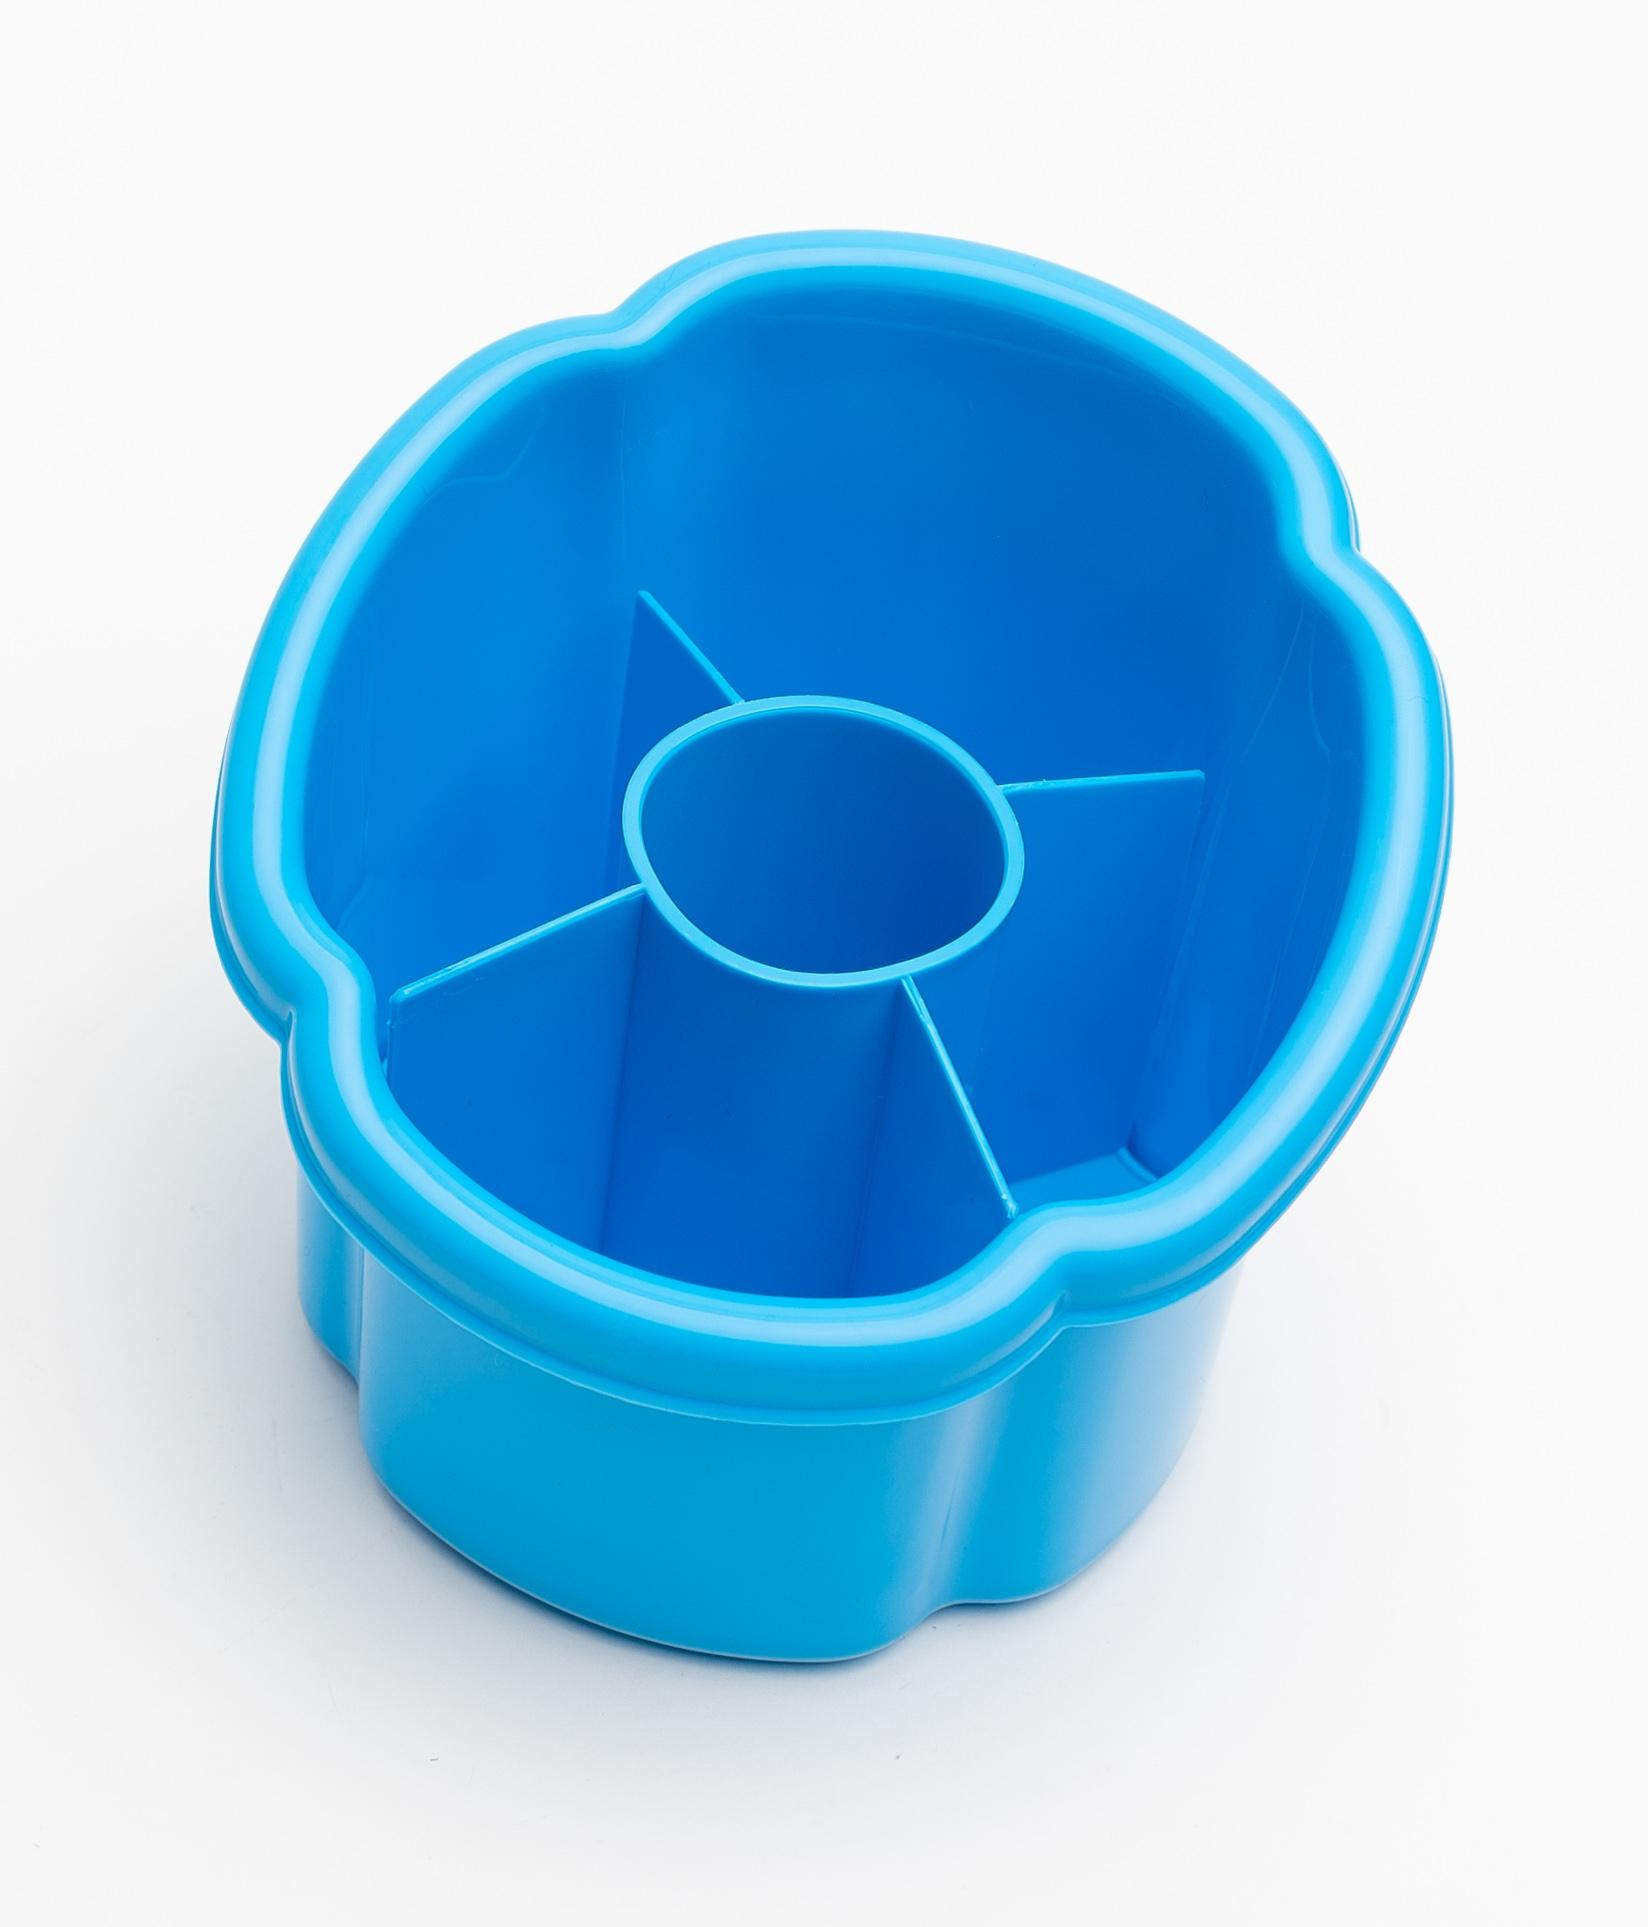 ESCURRE CUBIERTOS VERLON - BLUE